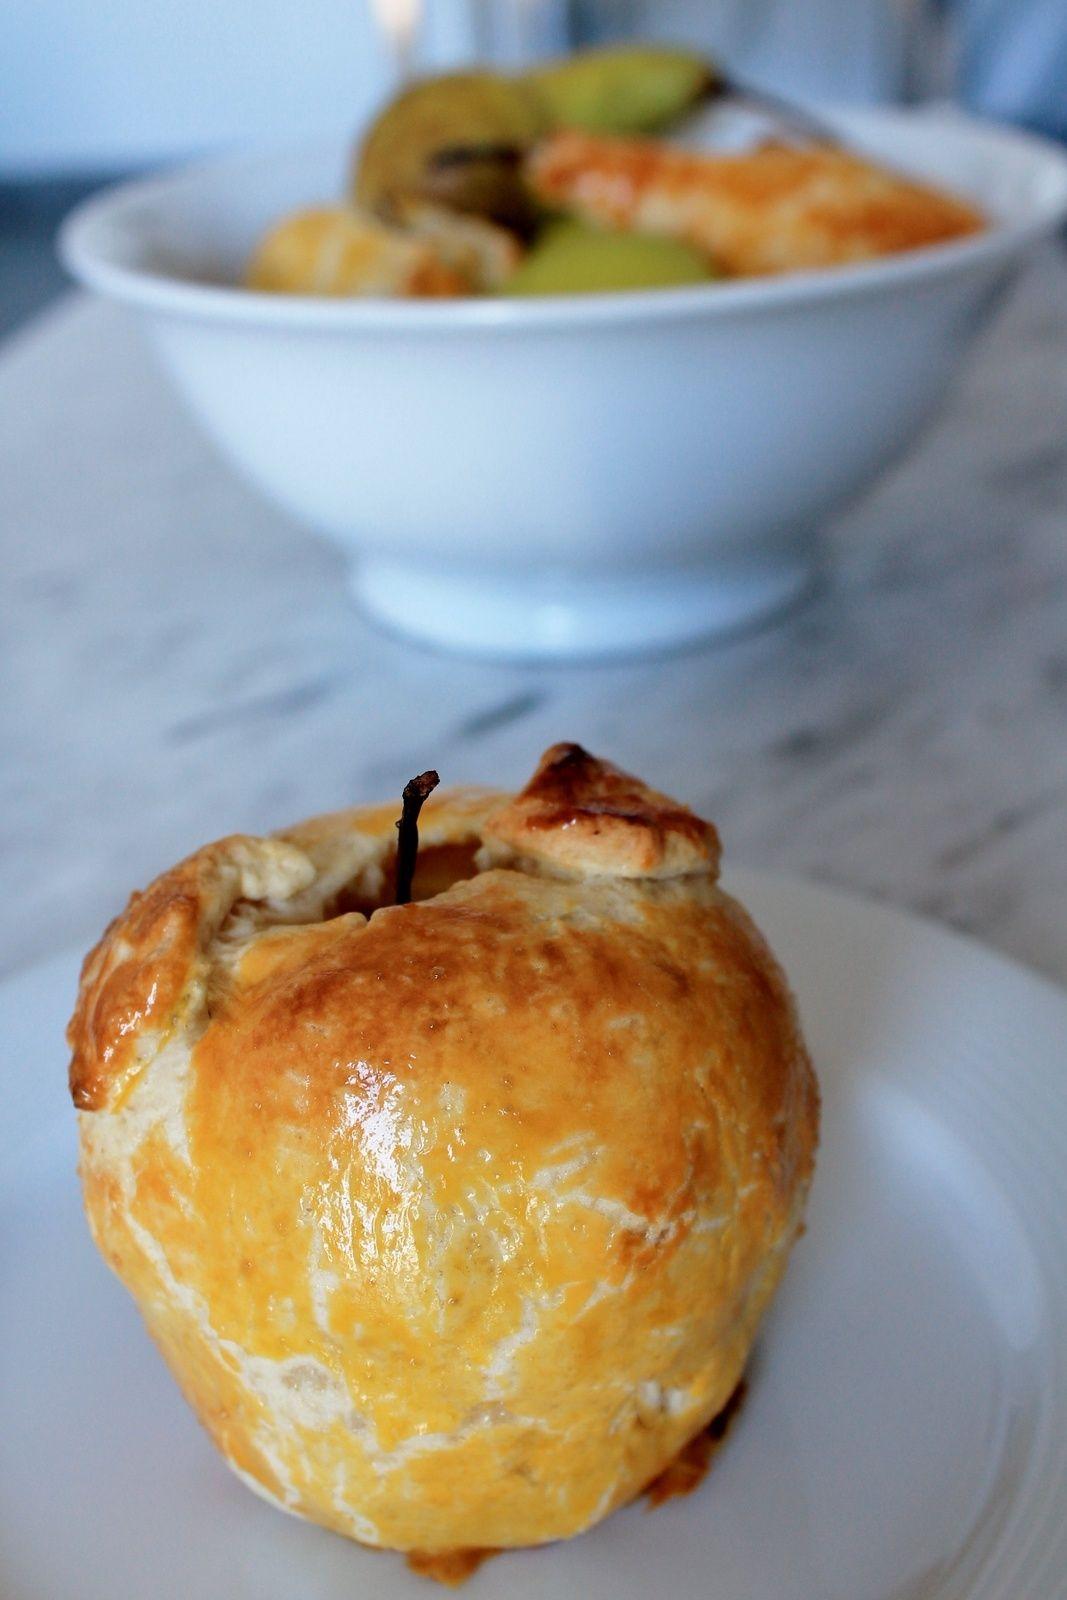 pastís de poma i pera (tarte pomme poire)